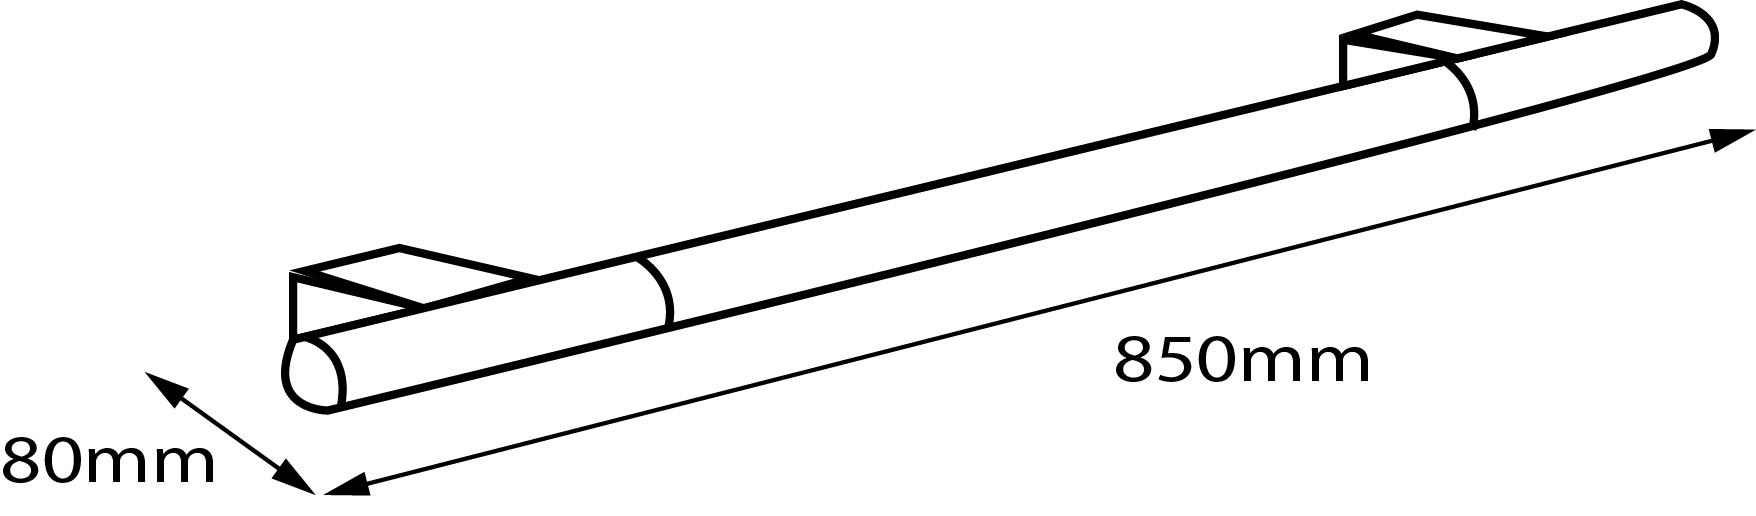 Iside Towel Rail (850mm)